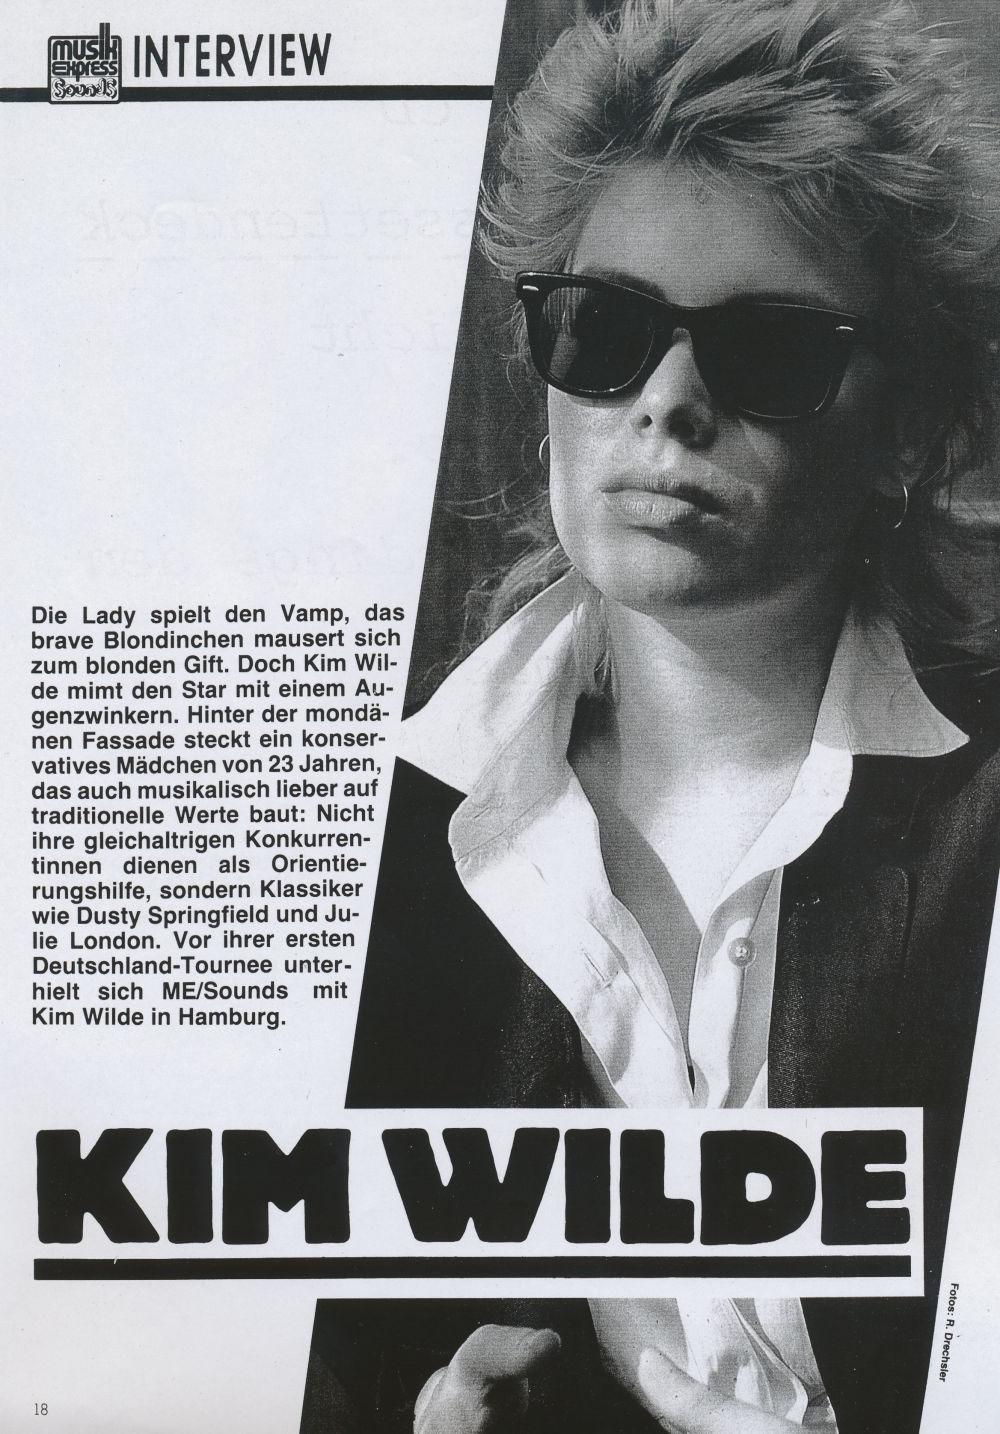 Wilde Sex Musik